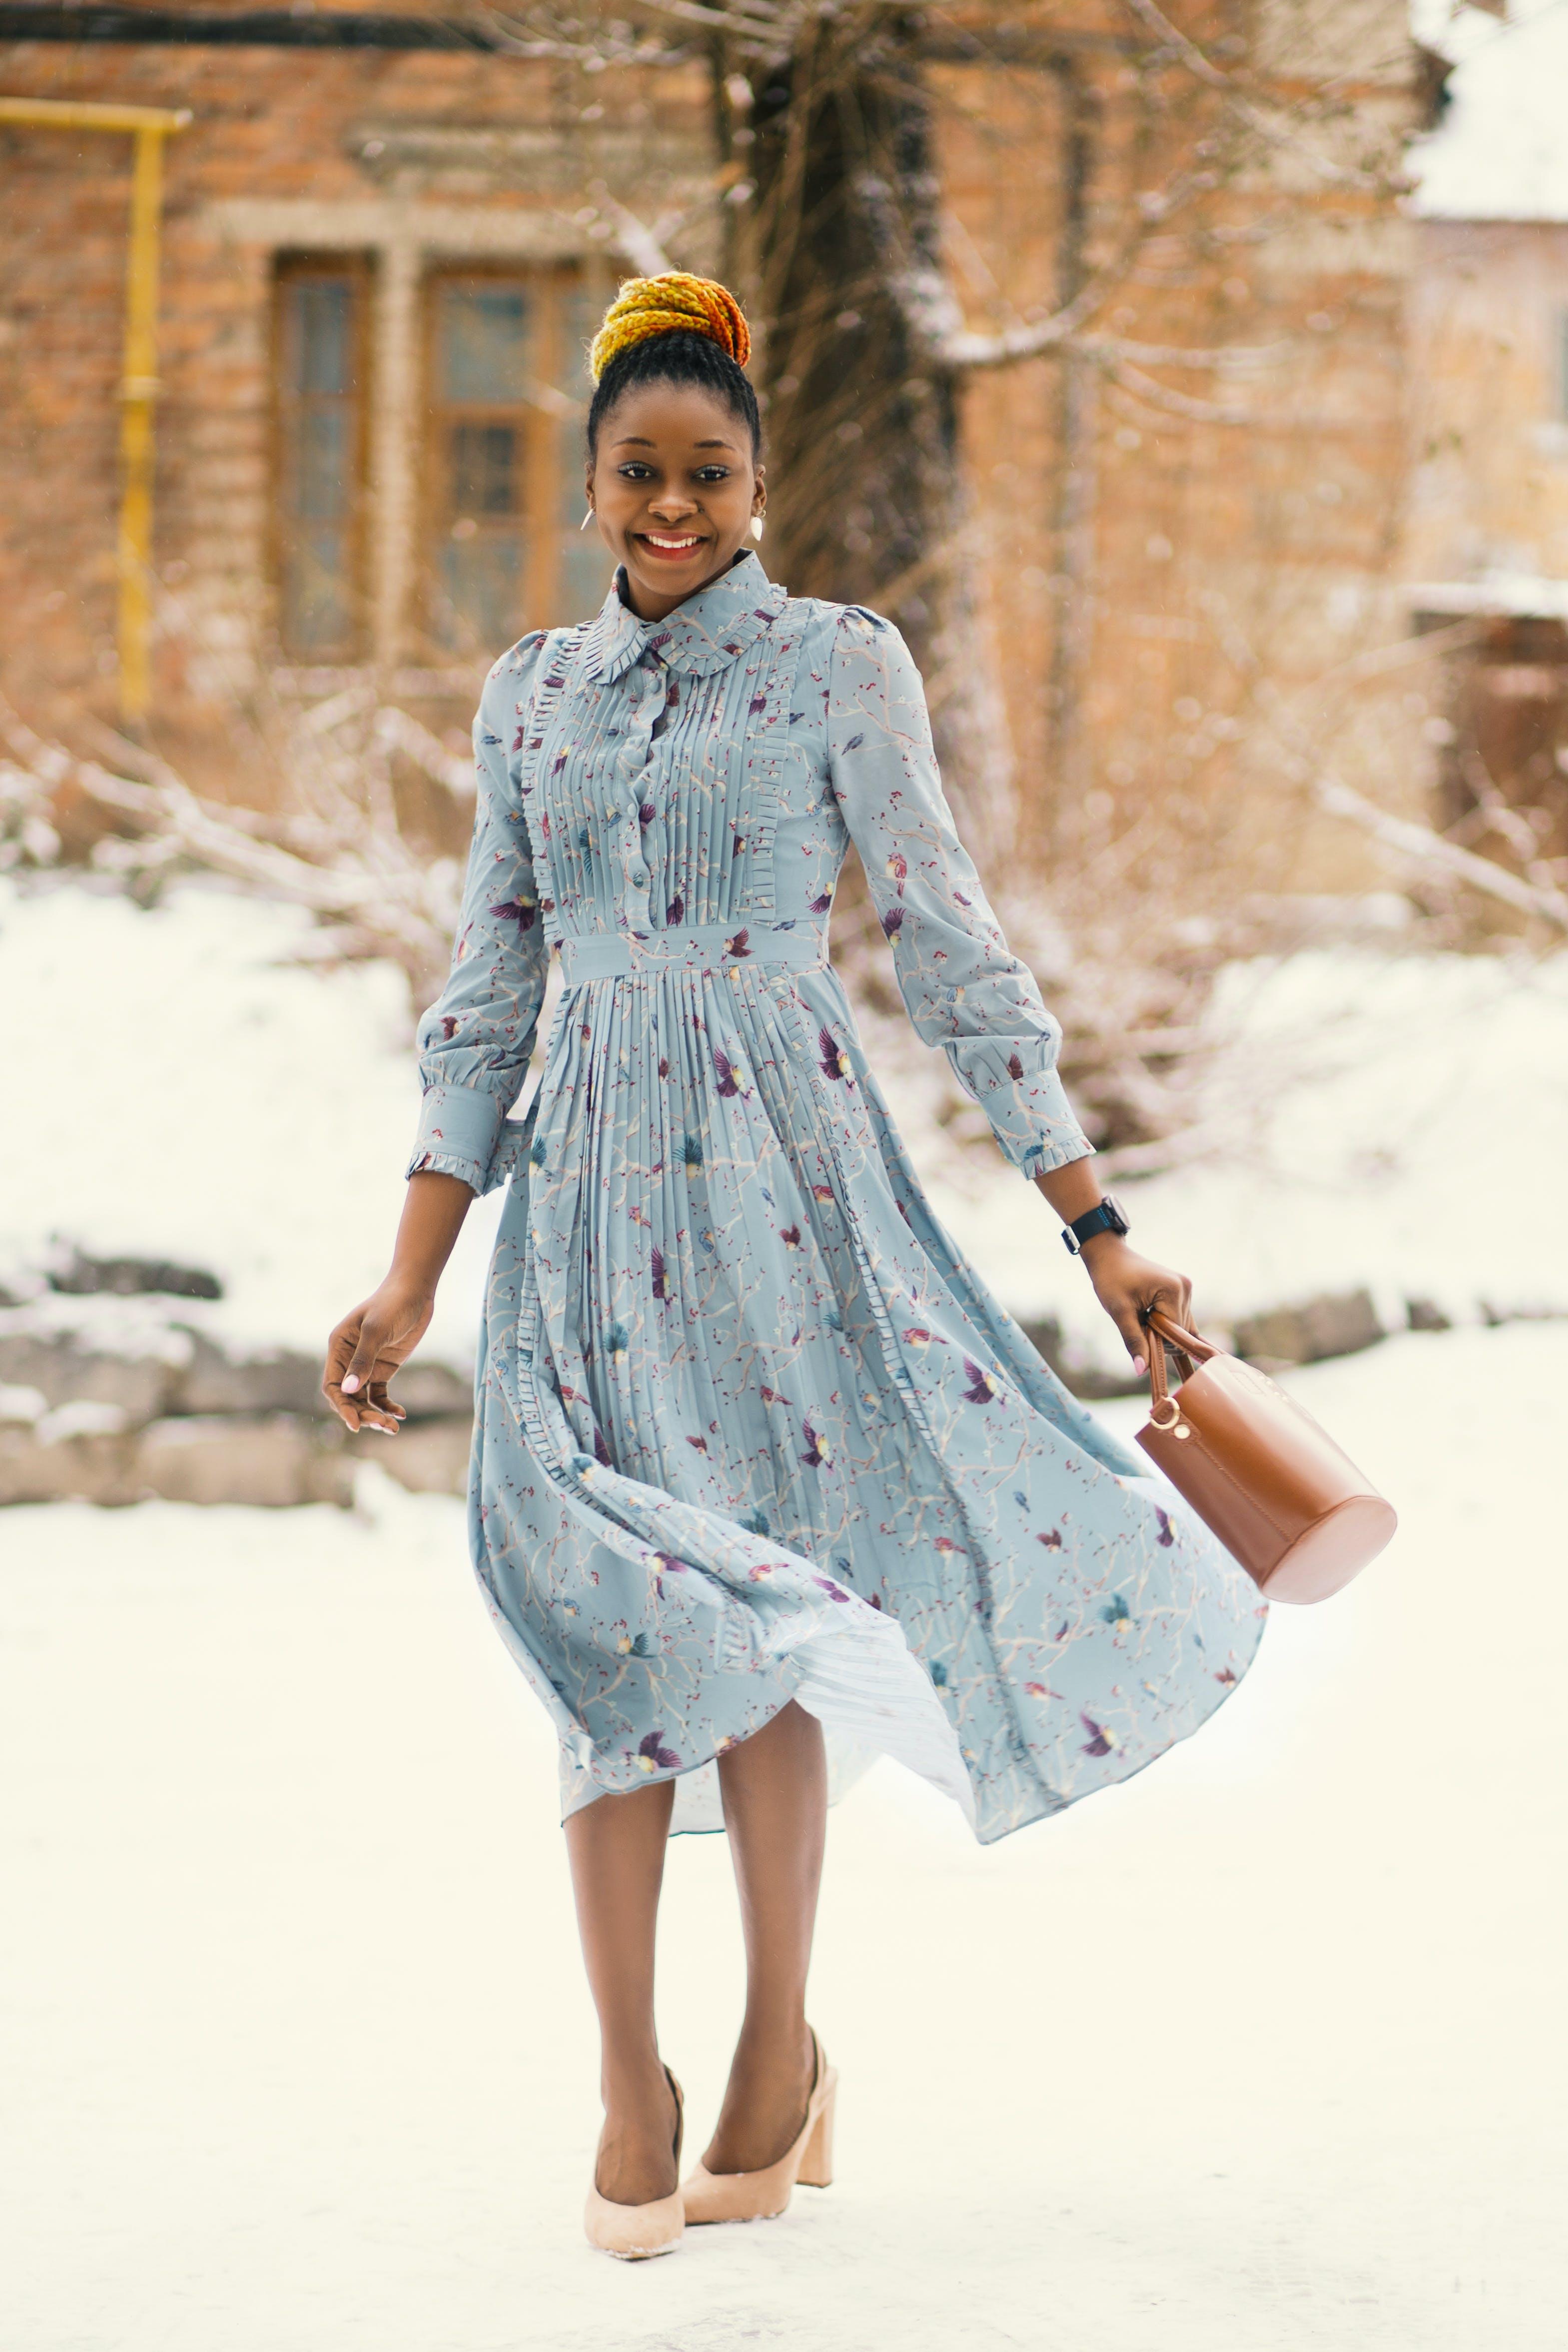 Woman In Blue Long-sleeved Dress